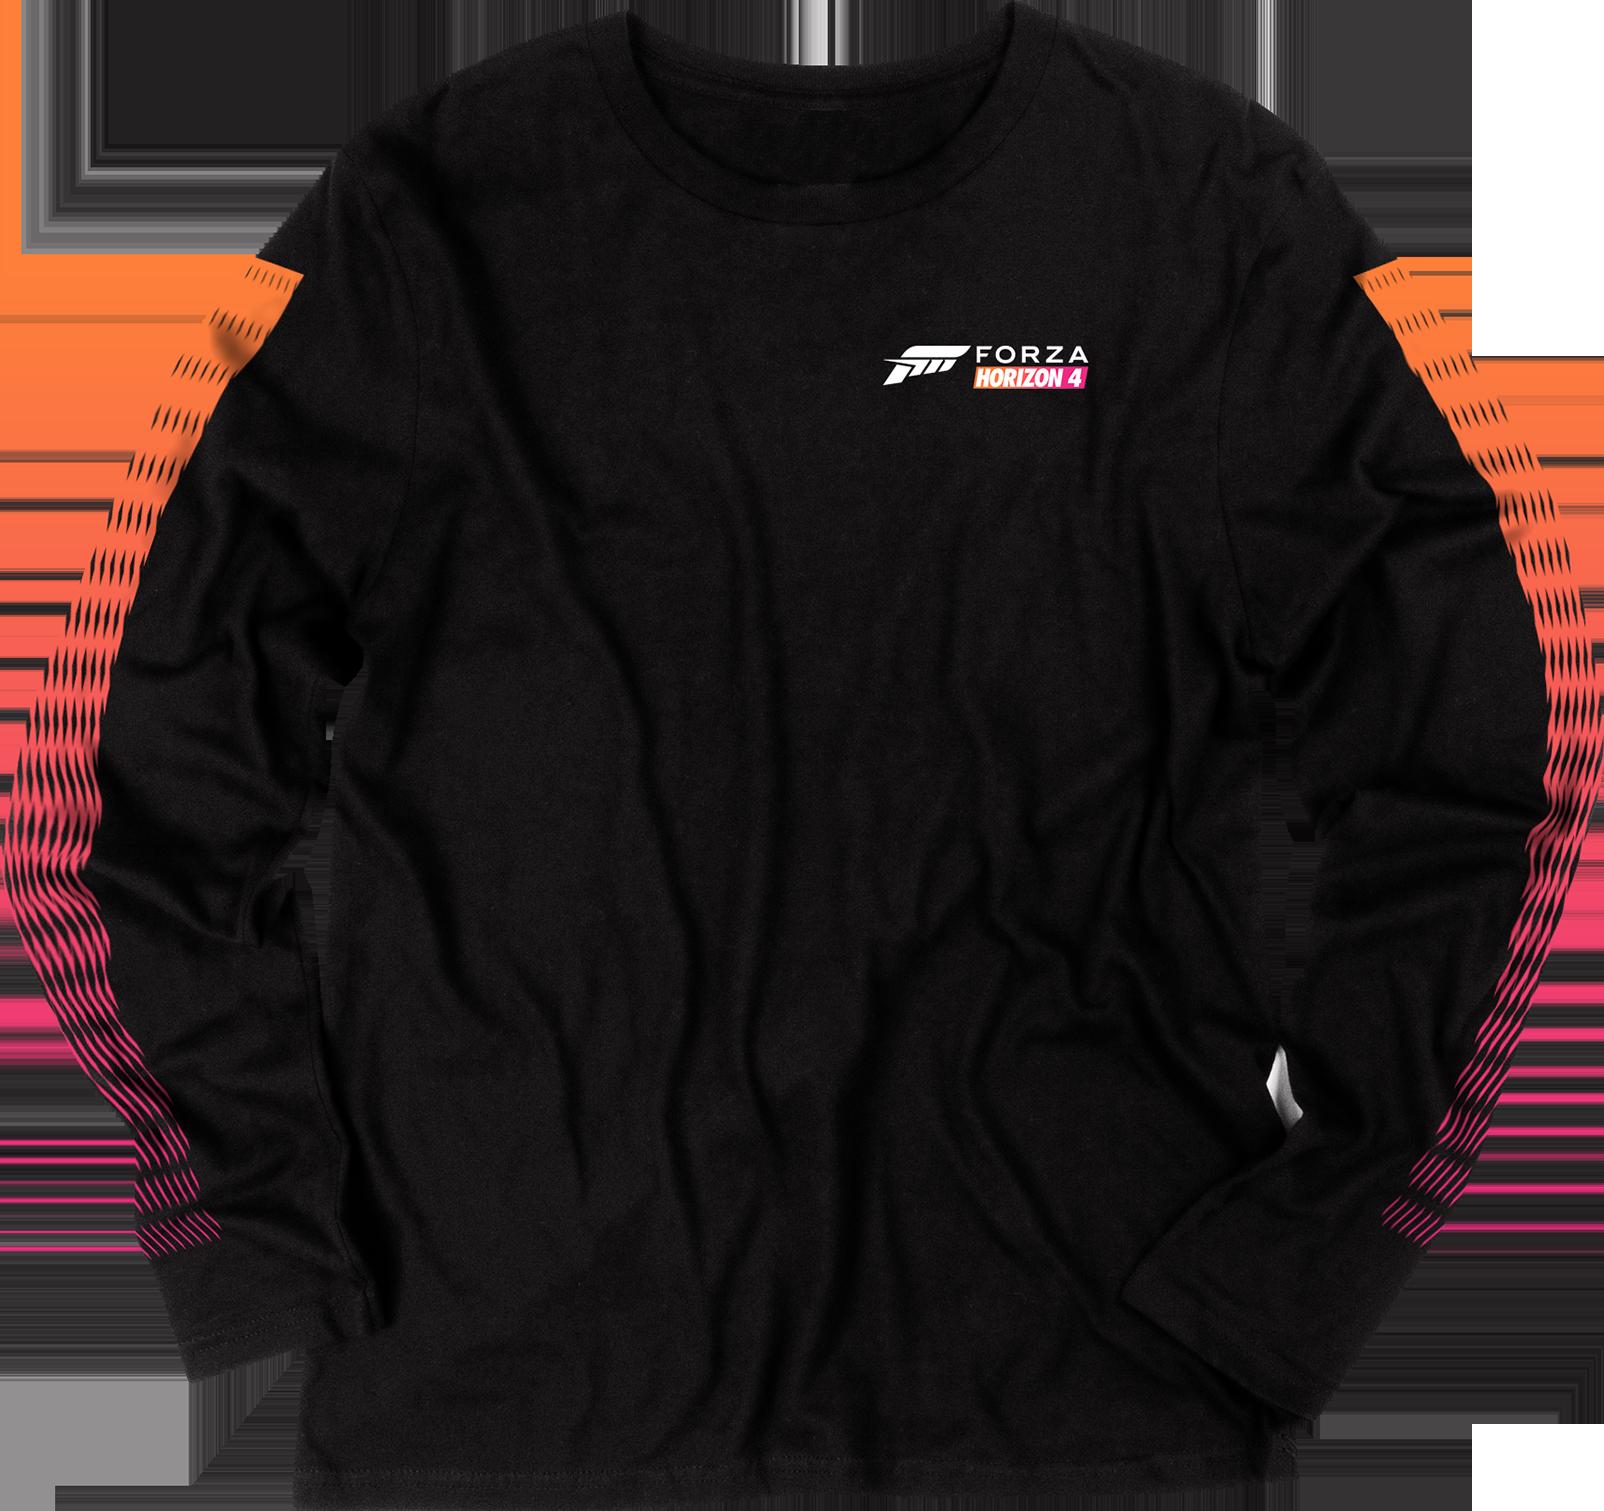 053f3ee8 Forza Horizon 4 Long Sleeve Tee - Unisex